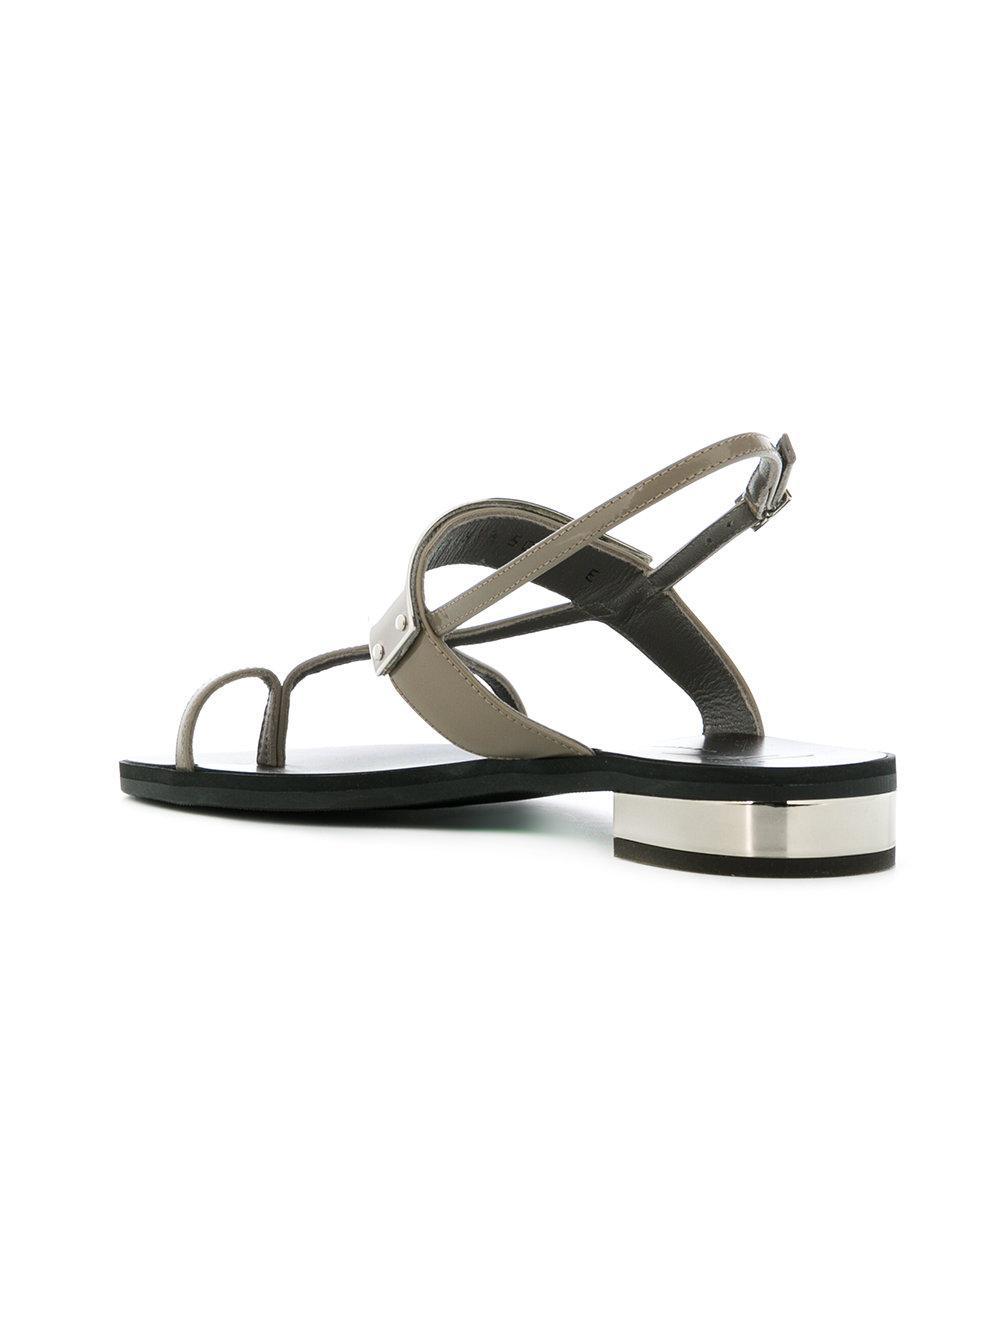 bar strap sandals - Grey Giuseppe Zanotti v4hwV